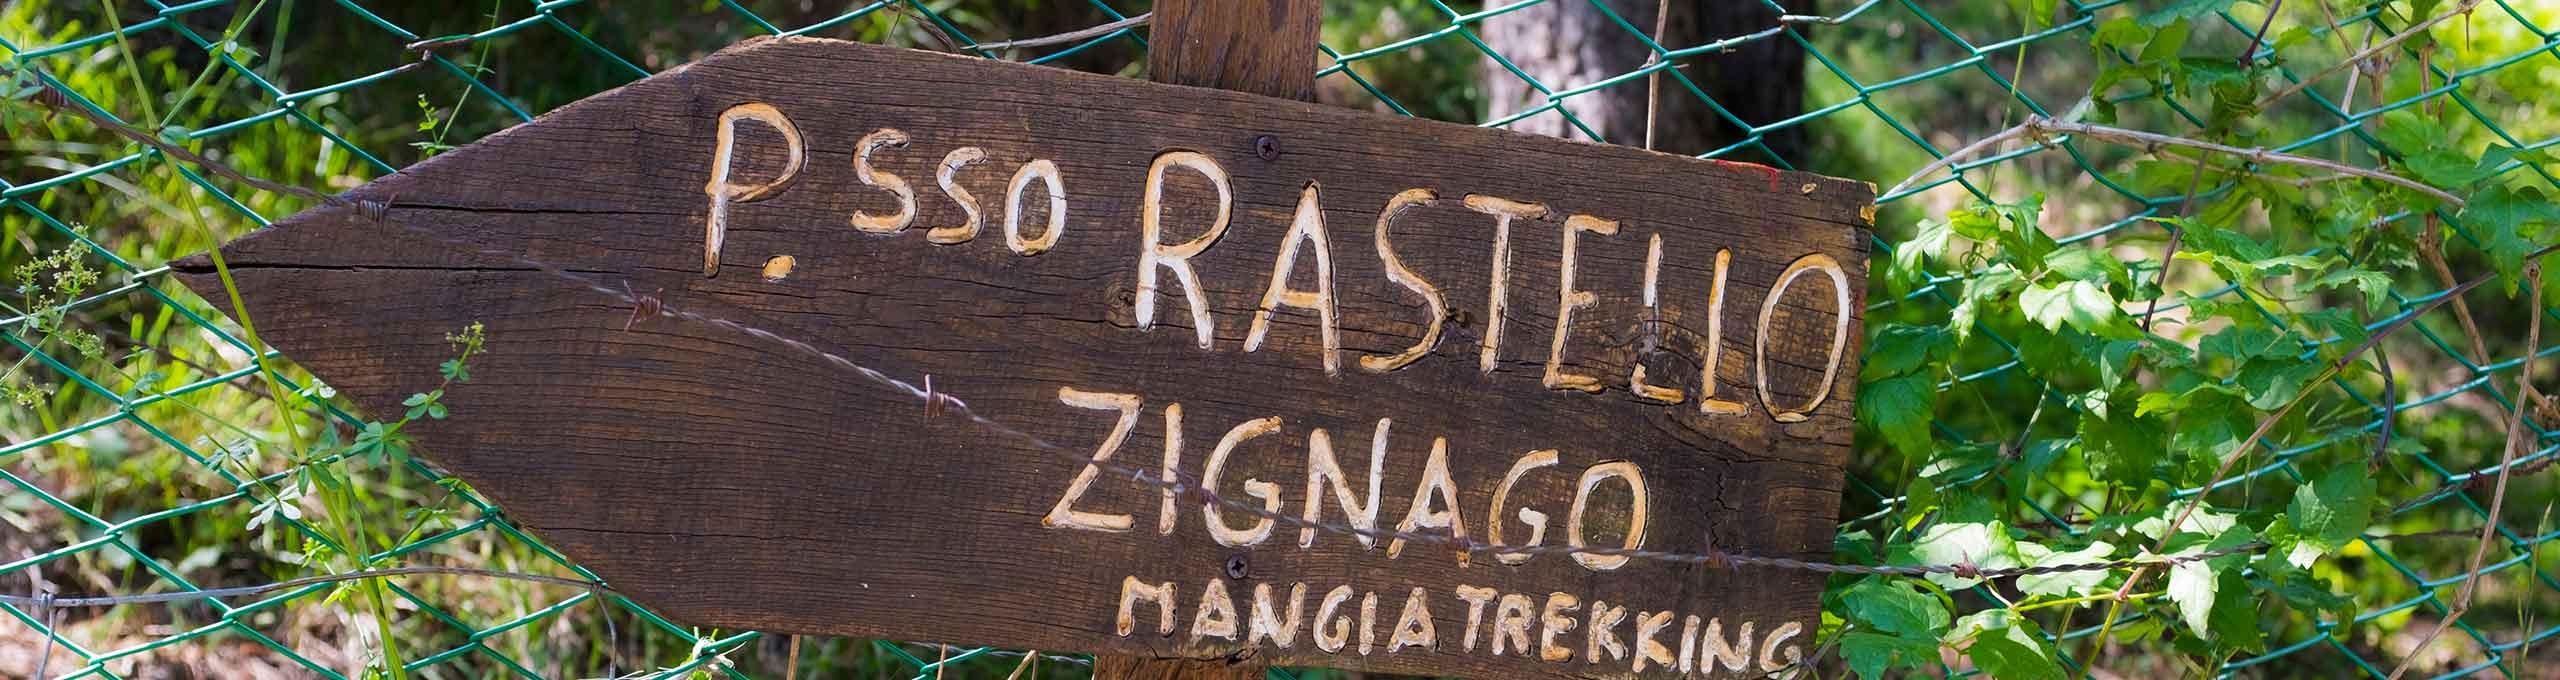 Zignago, Val di Vara